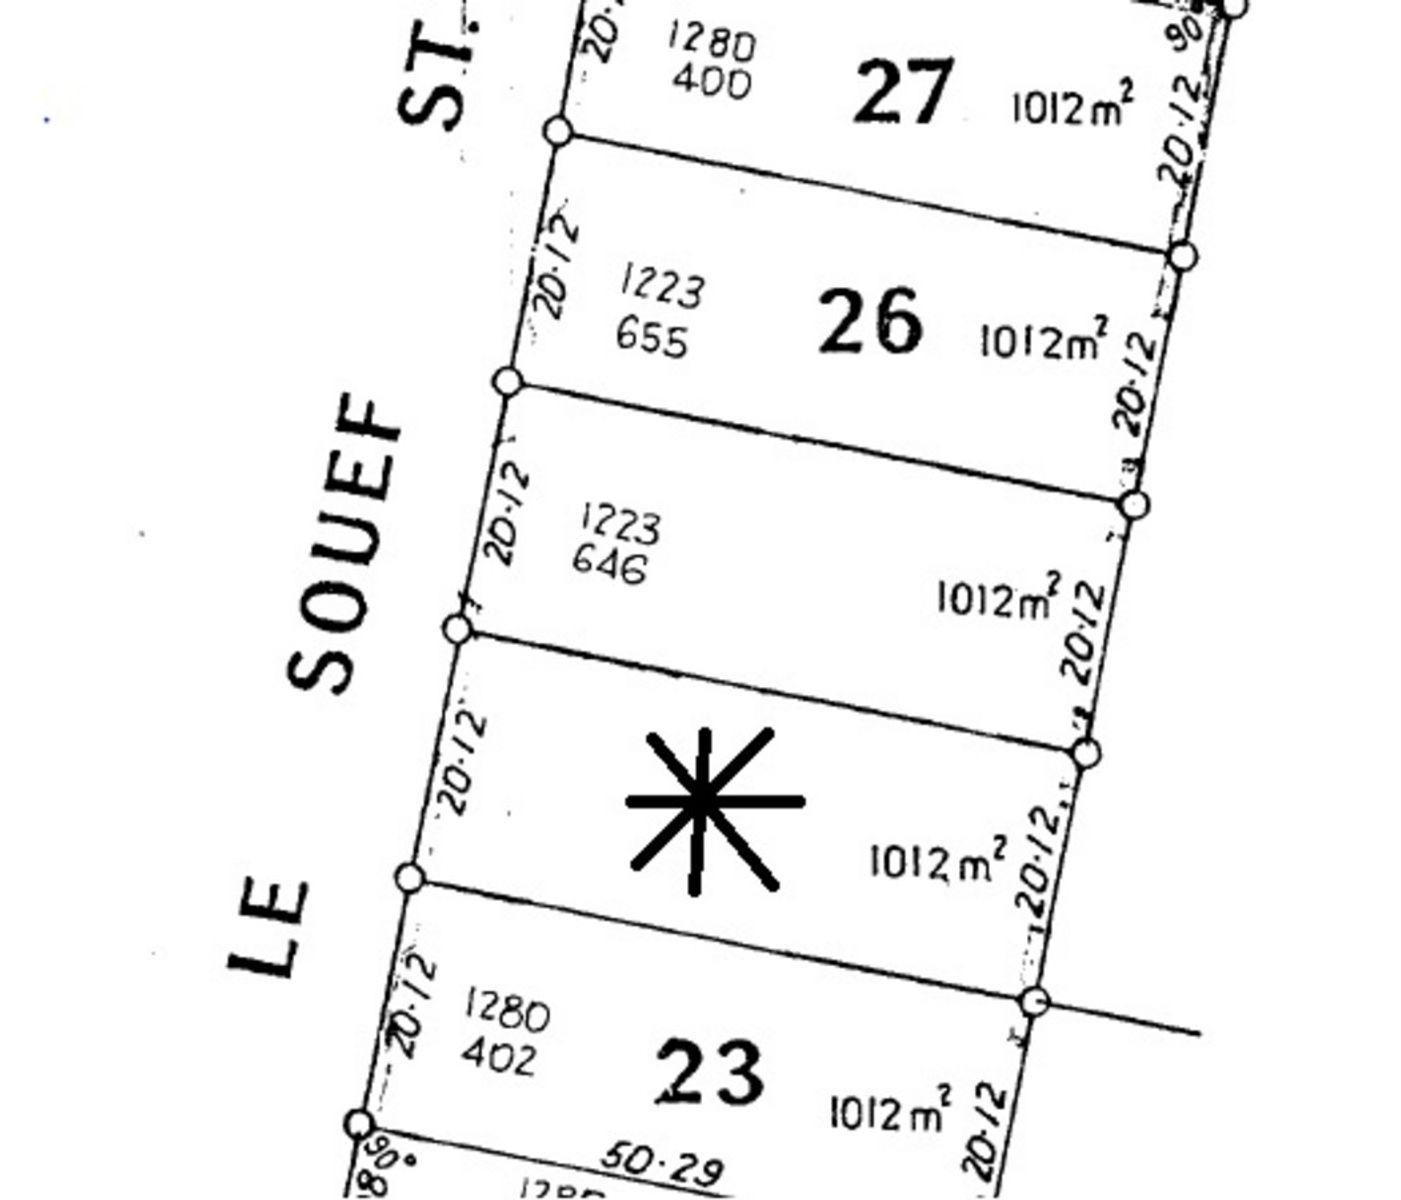 21 Le Souef Street, Margaret River, WA 6285